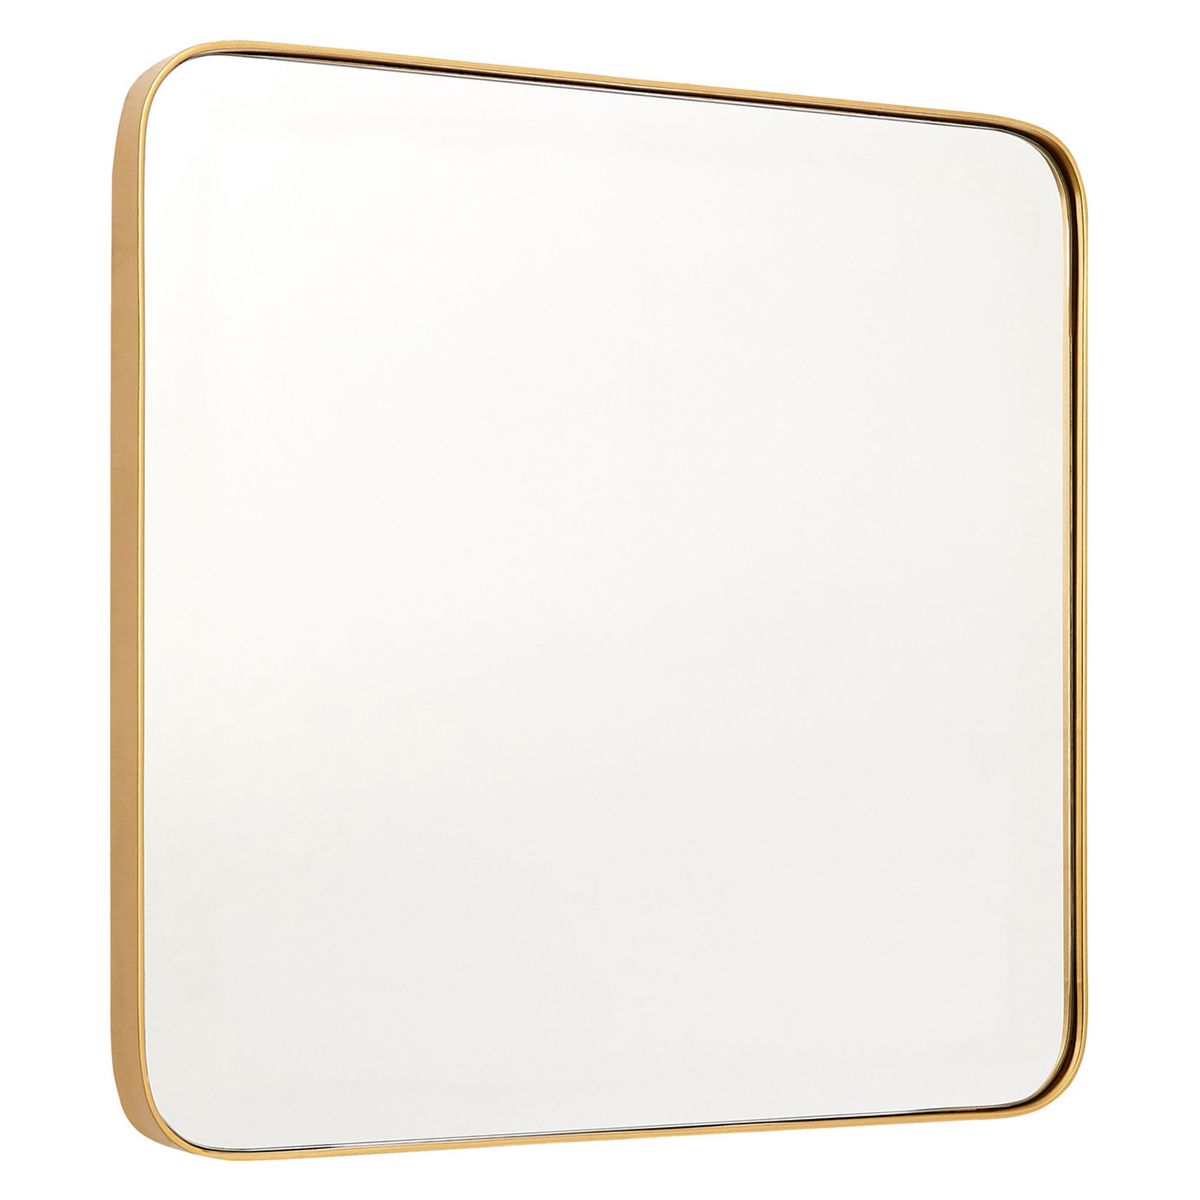 Medium Square Wall Mirror - Gold Finish